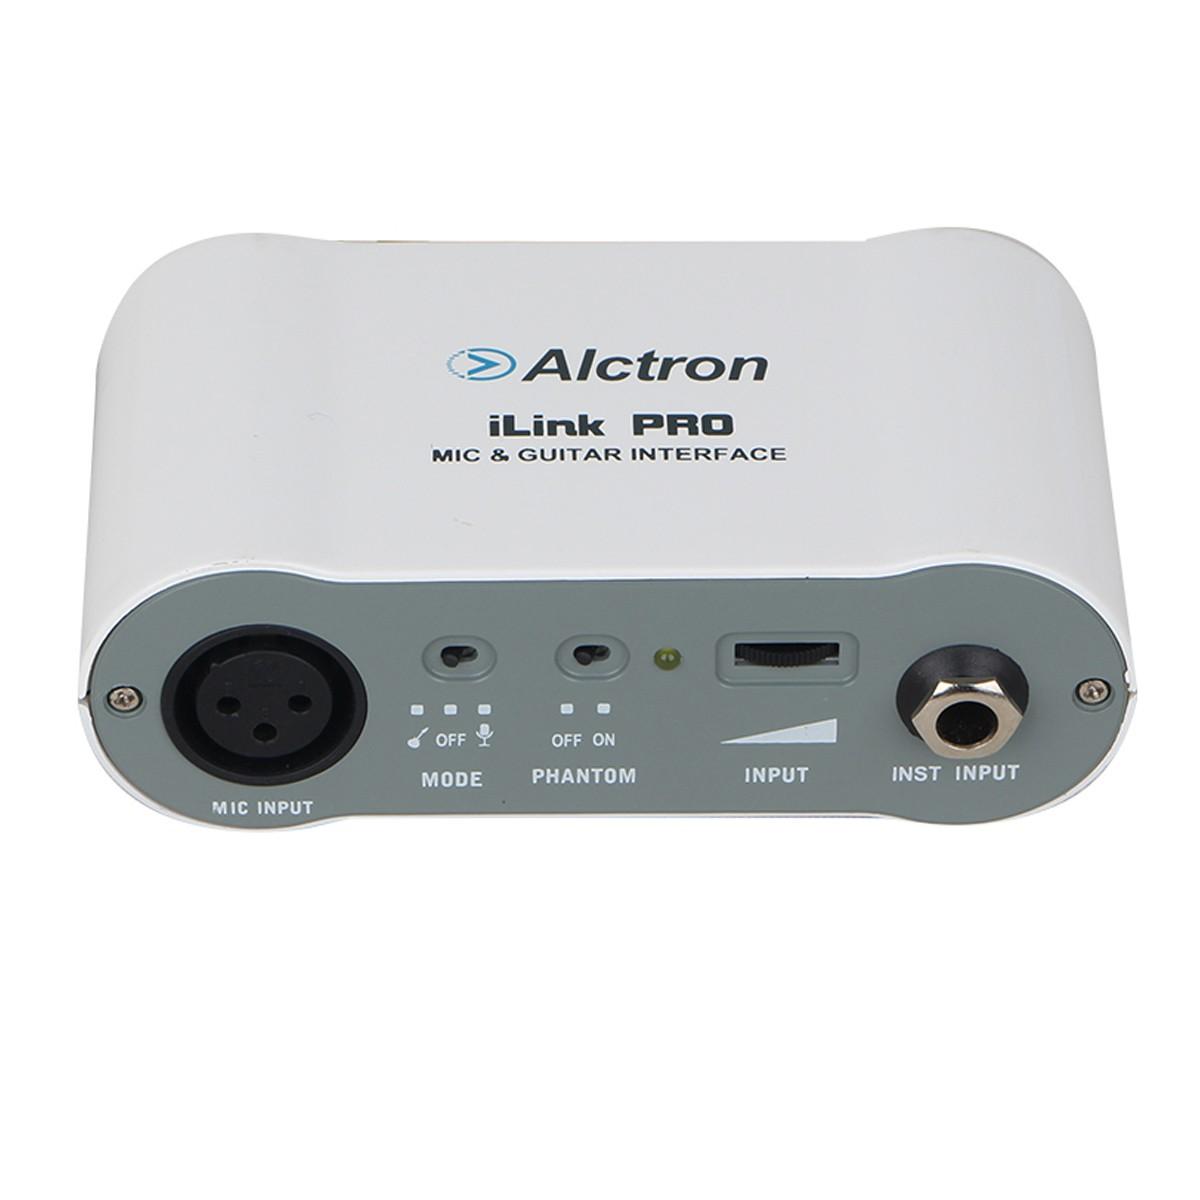 Interface Smartphone 1 Mic ou 1 Inst 48V Alctron iLinkPro